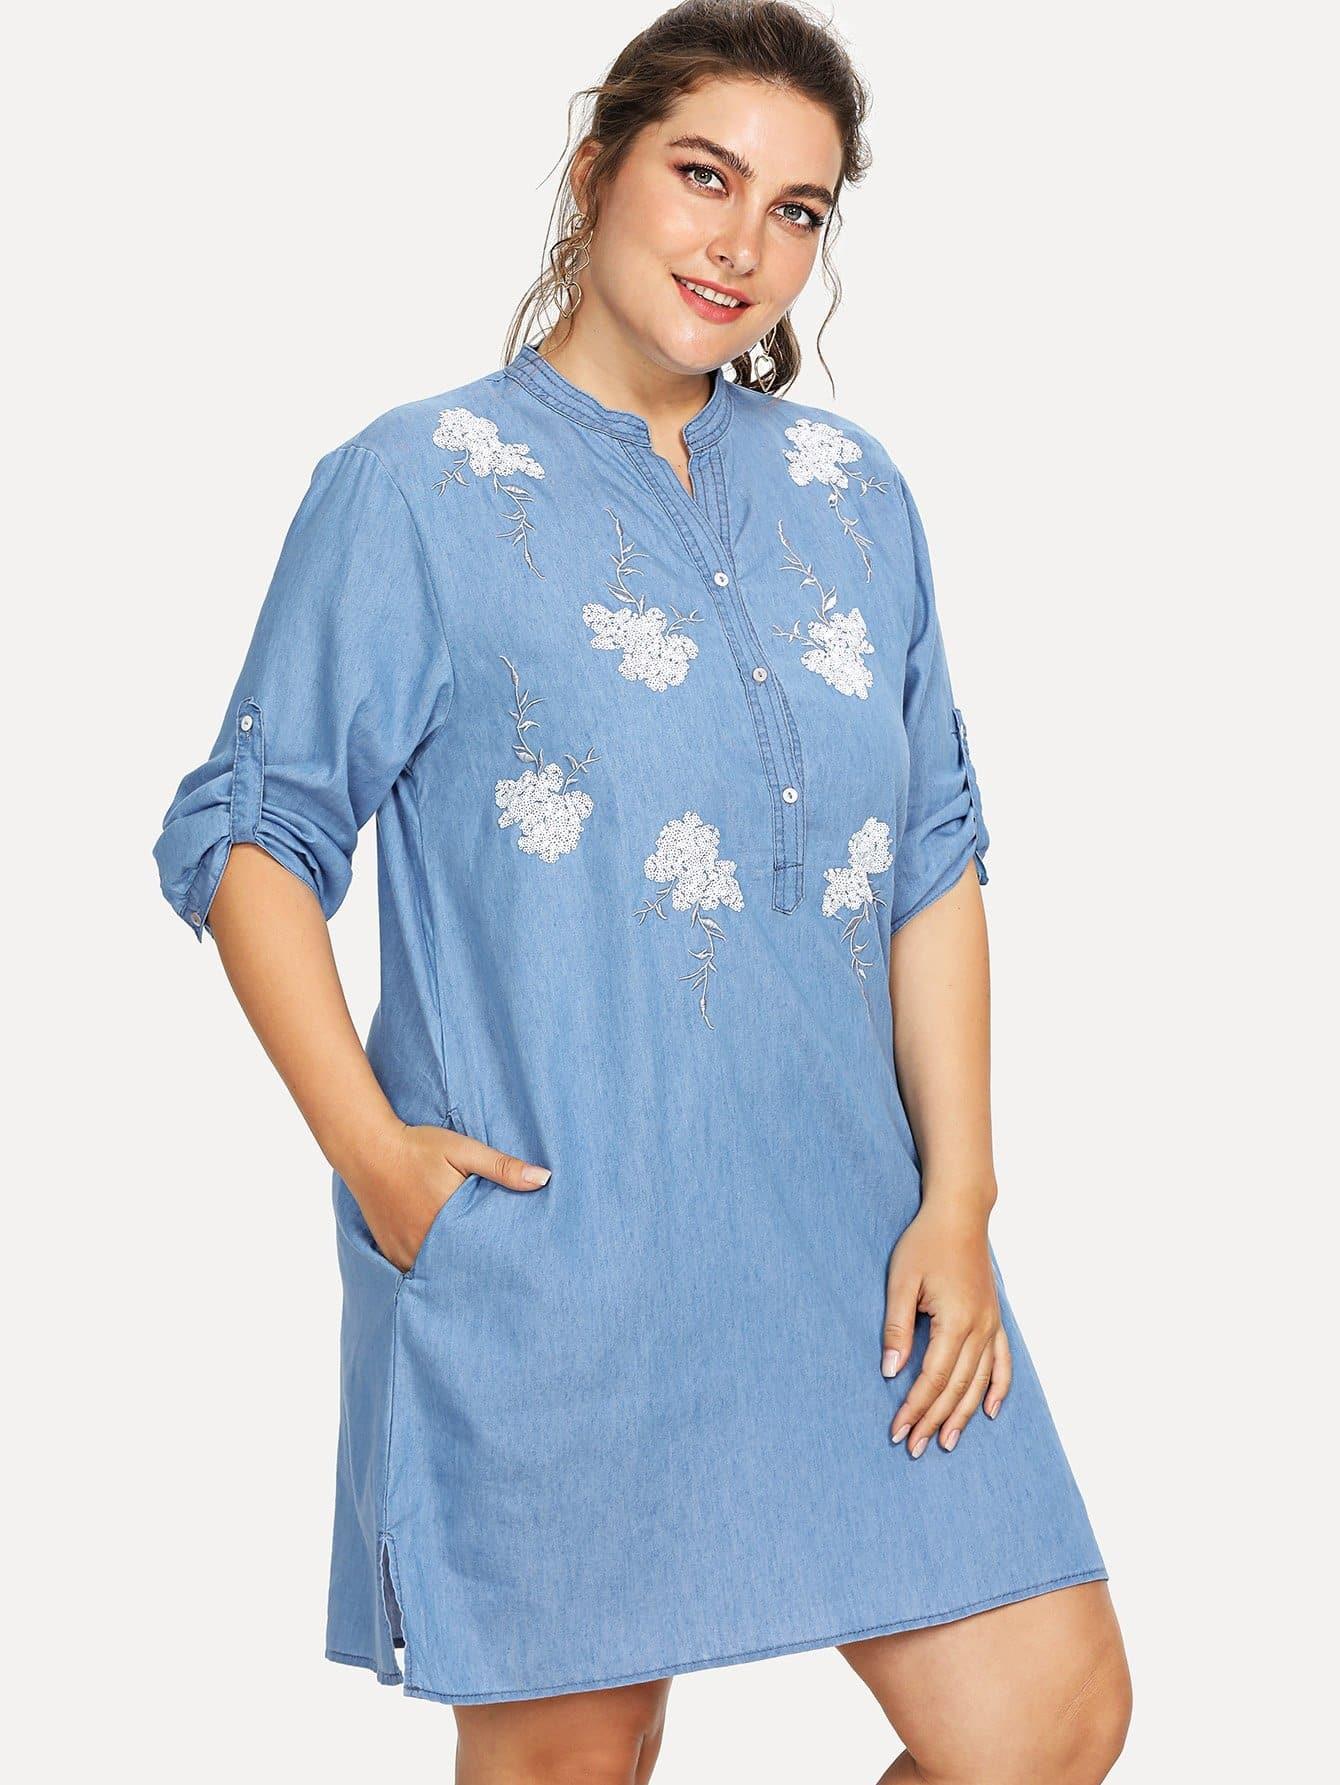 Flower Embroidered Denim Dress embroidered sleeve denim tunic dress